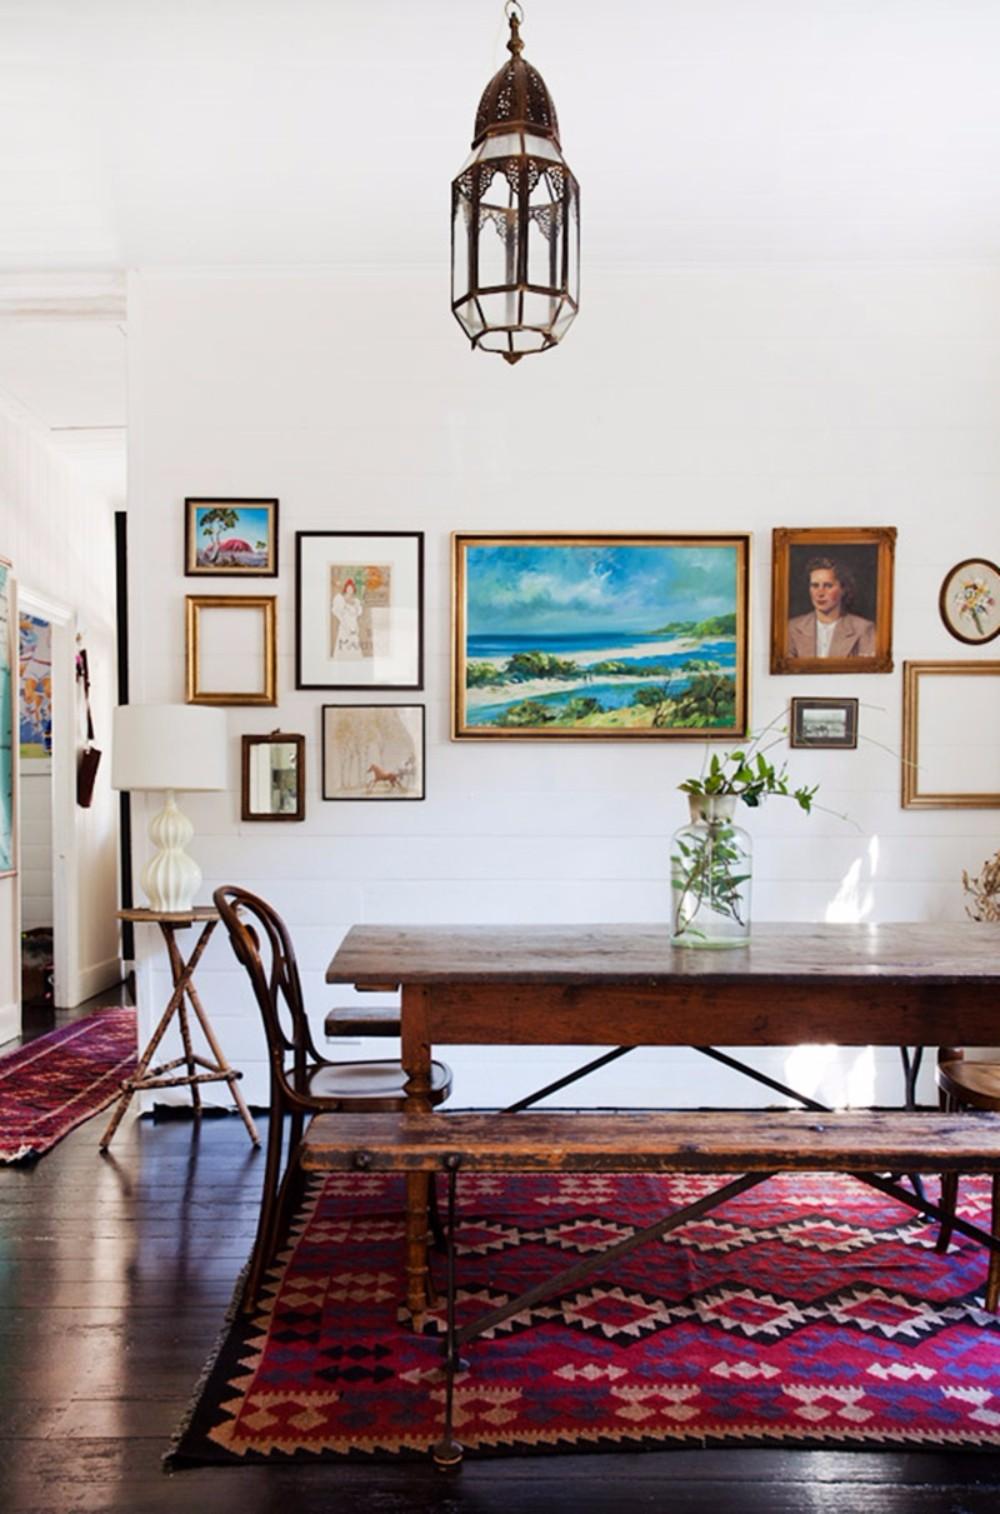 boho chic 25 Boho Chic Dining Room Designs That Will Inspire You 25 boho chic dining room designs that will inspire you 8